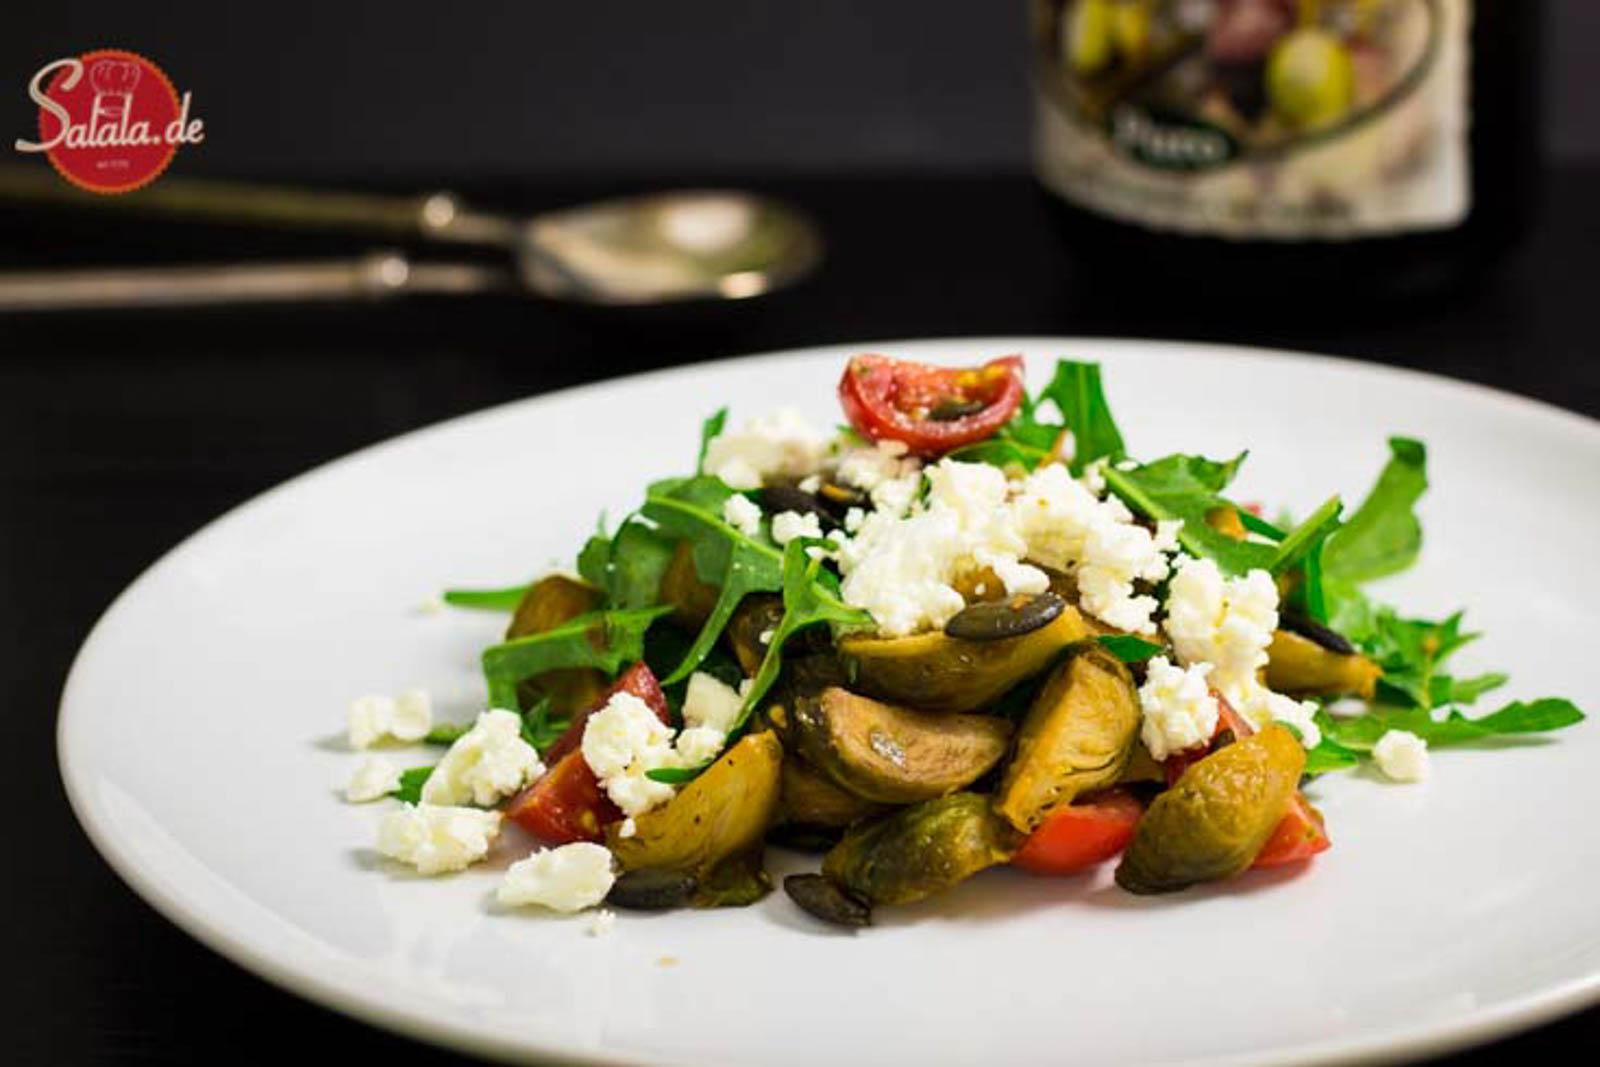 Gerösteter Rosenkohlsalat mit Feta und Rucola und Kürbiskernen Rezept Low Carb Salat salala.de